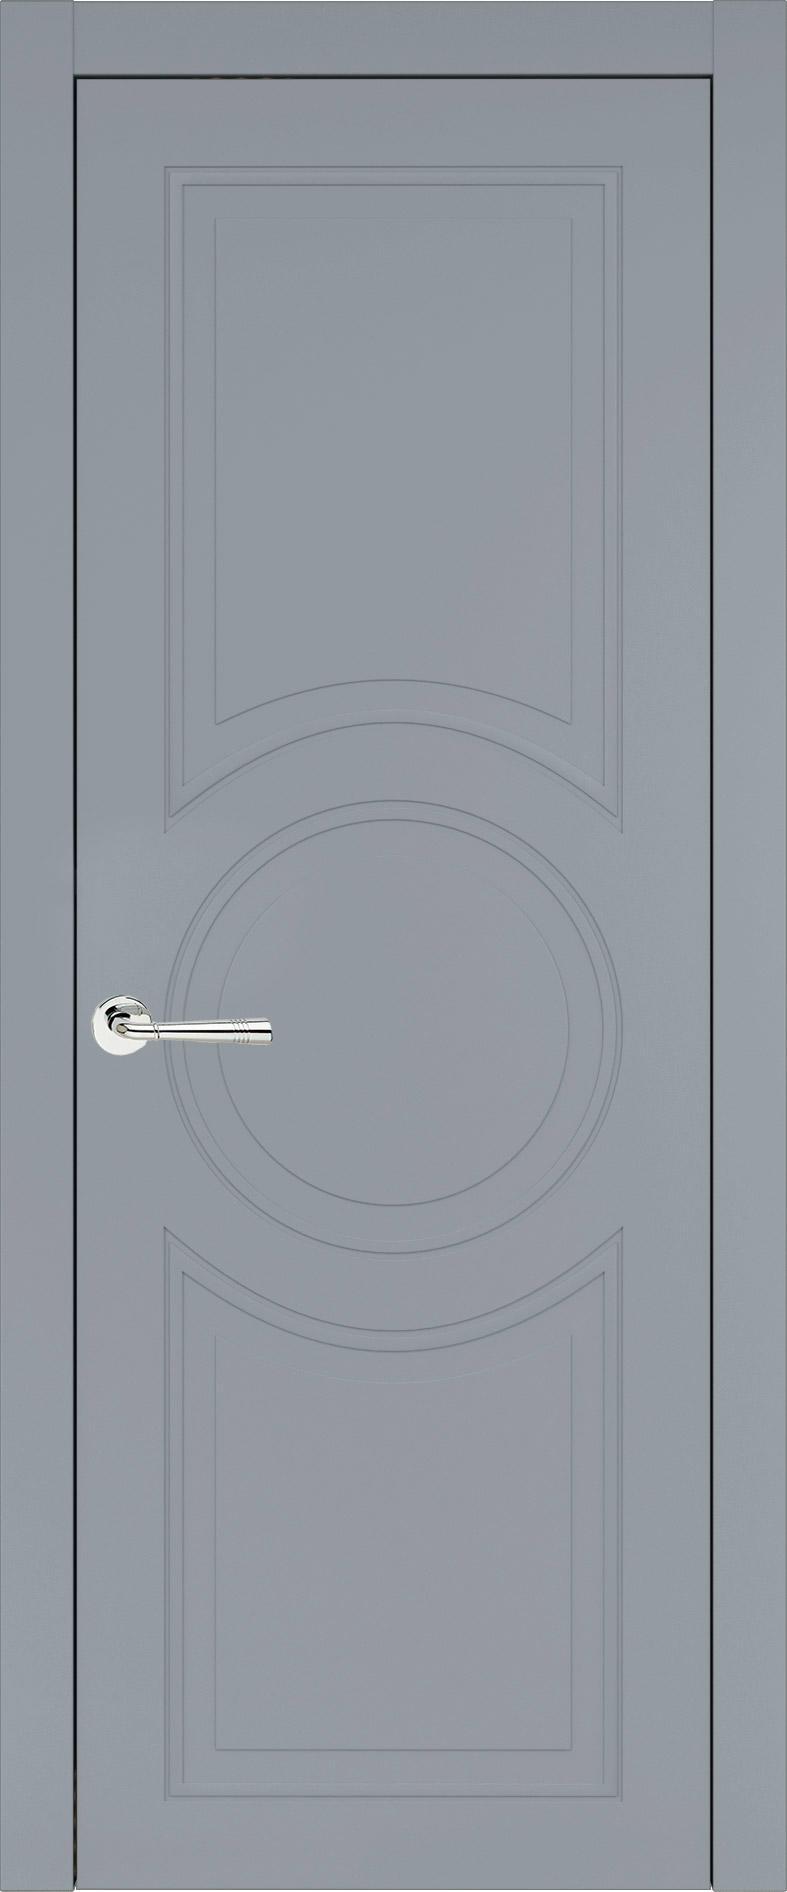 Ravenna Neo Classic цвет - Серебристо-серая эмаль (RAL 7045) Без стекла (ДГ)